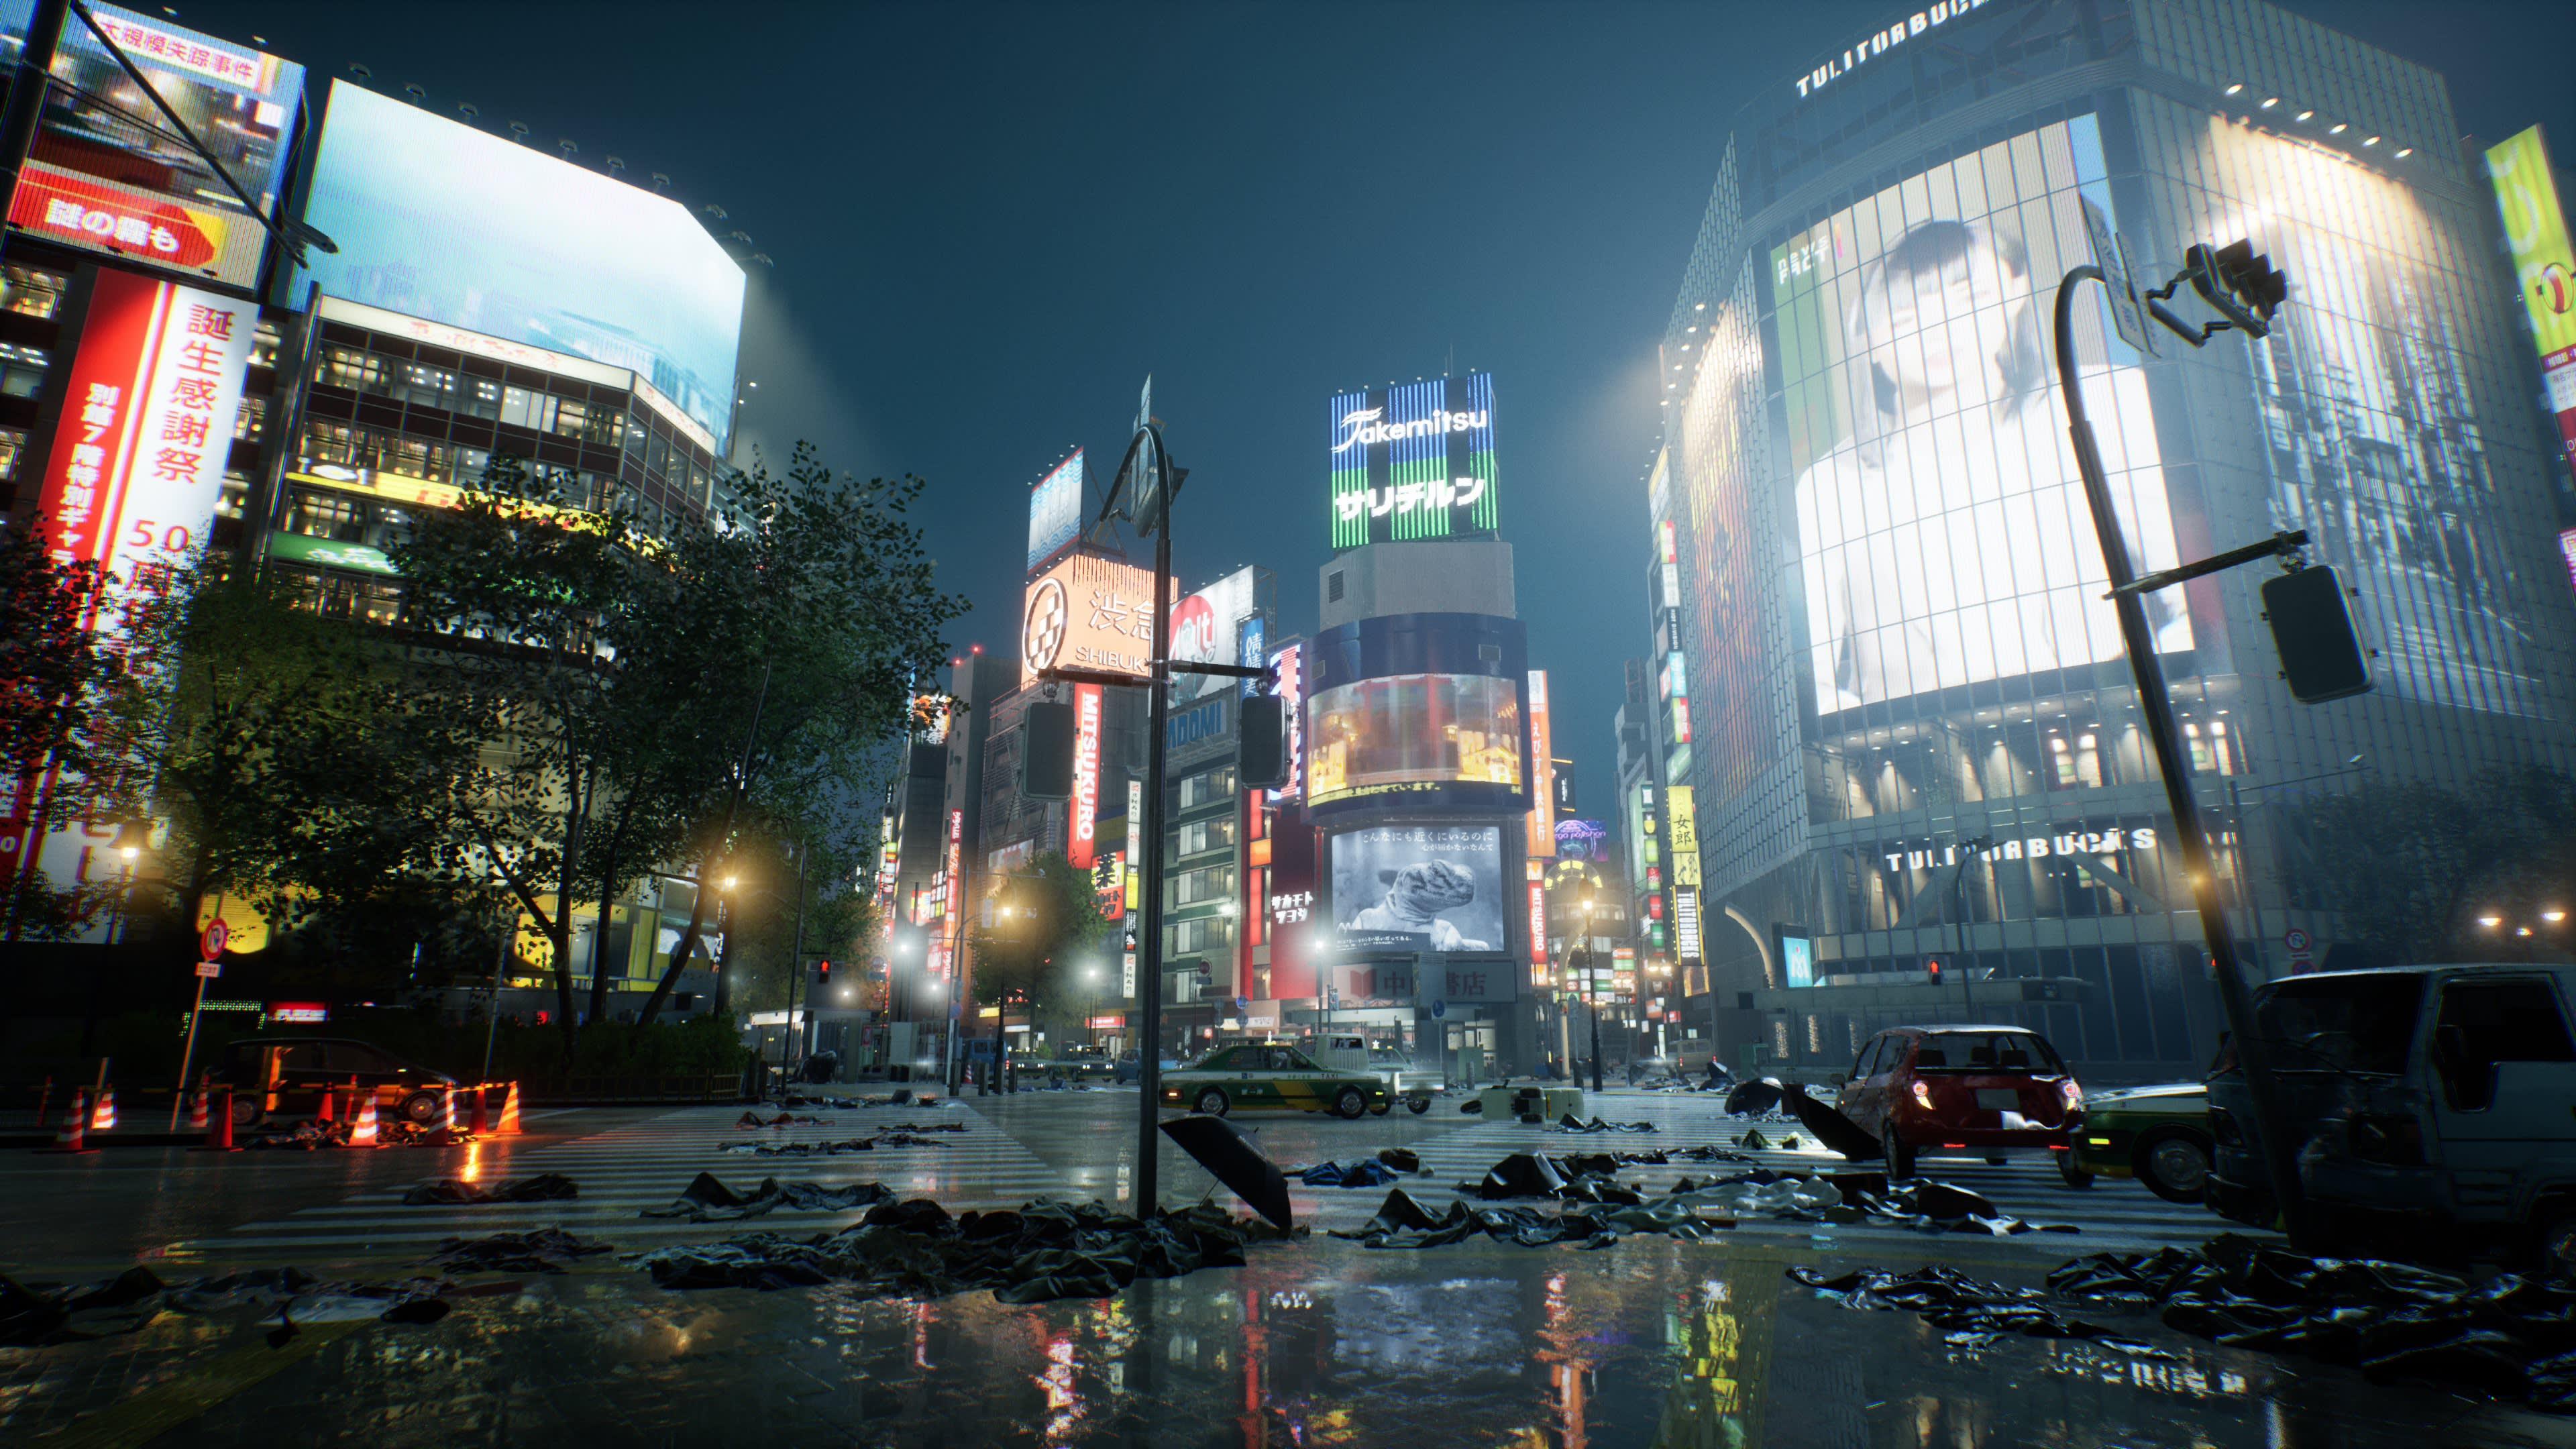 delayed in 2021 Ghostwire: tokyo